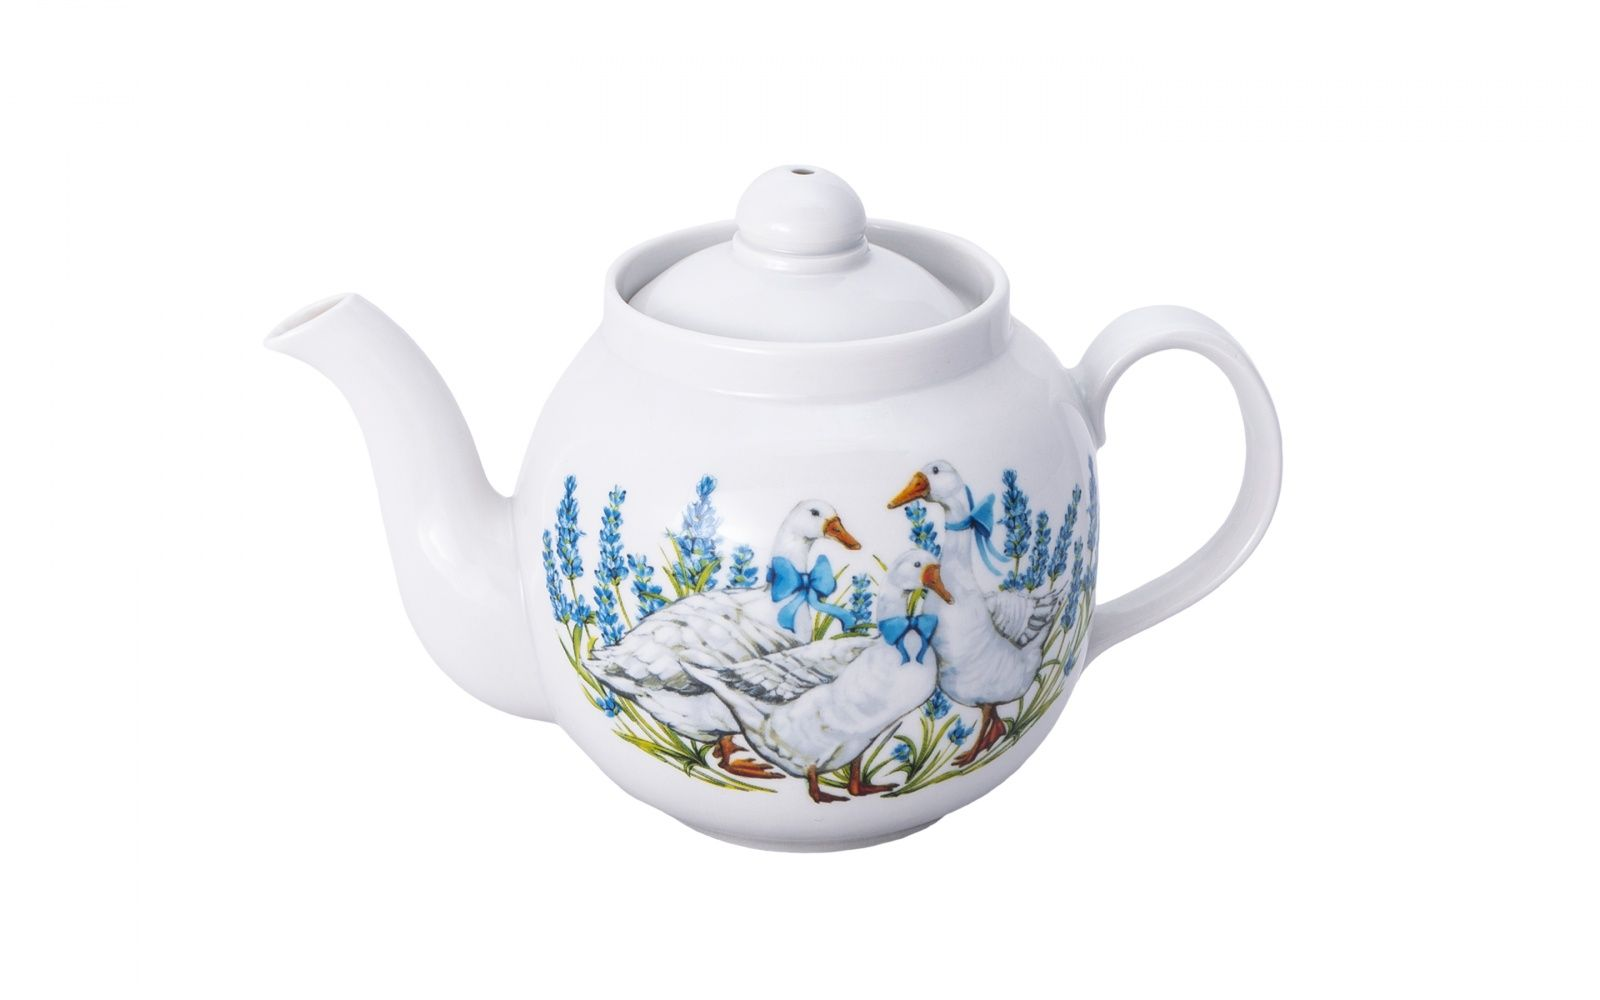 Dulevo porcelain / Teapot 700 ml Amber Geese